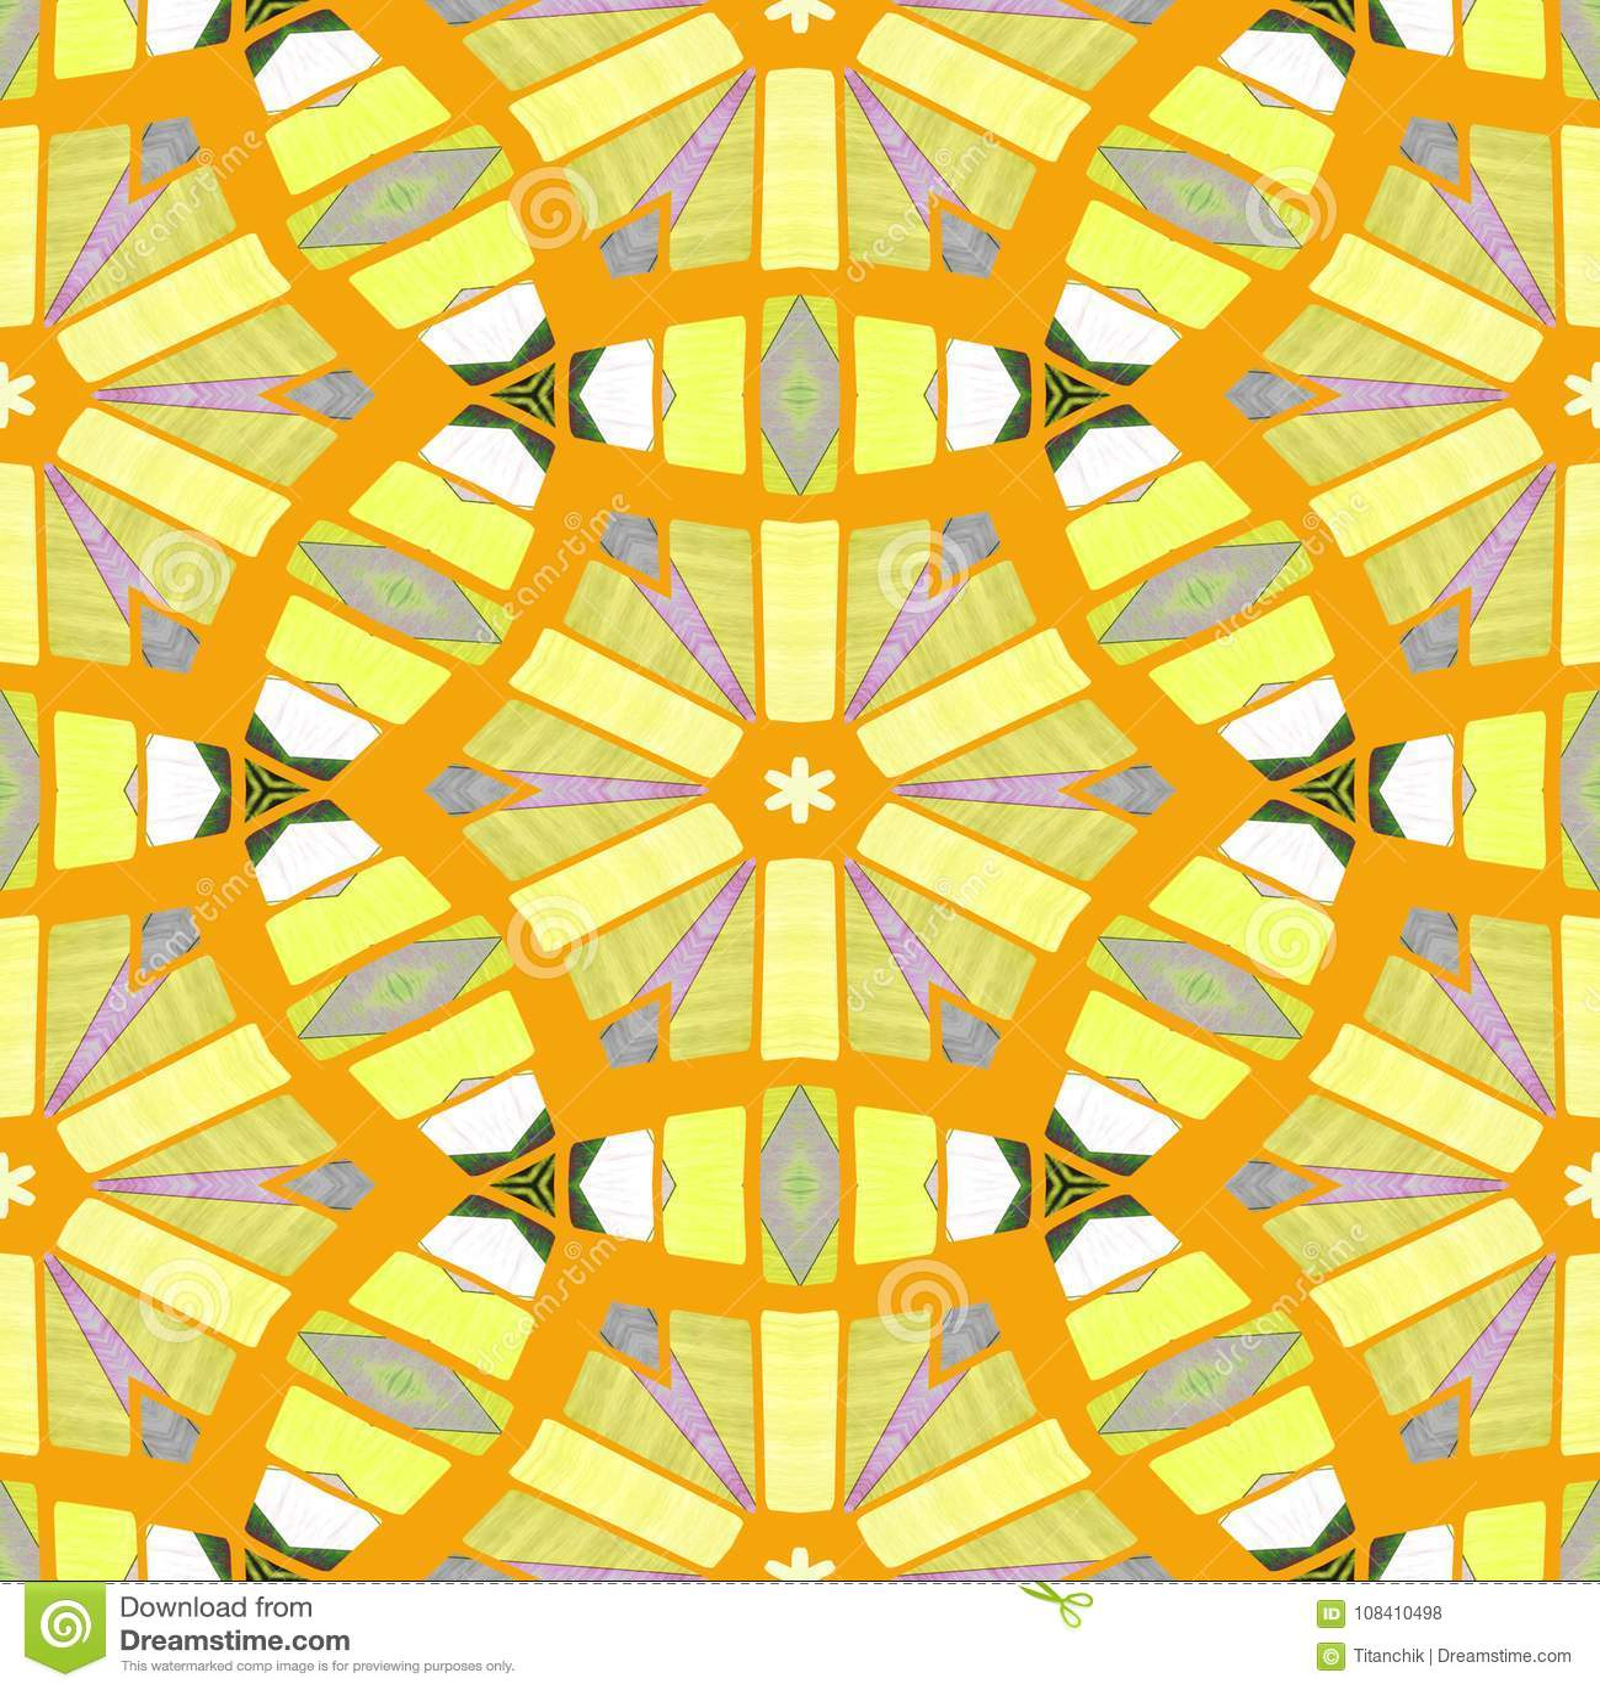 Spiritual And Mathematical- Mosaic Illustration. Print Napkins Stock ...